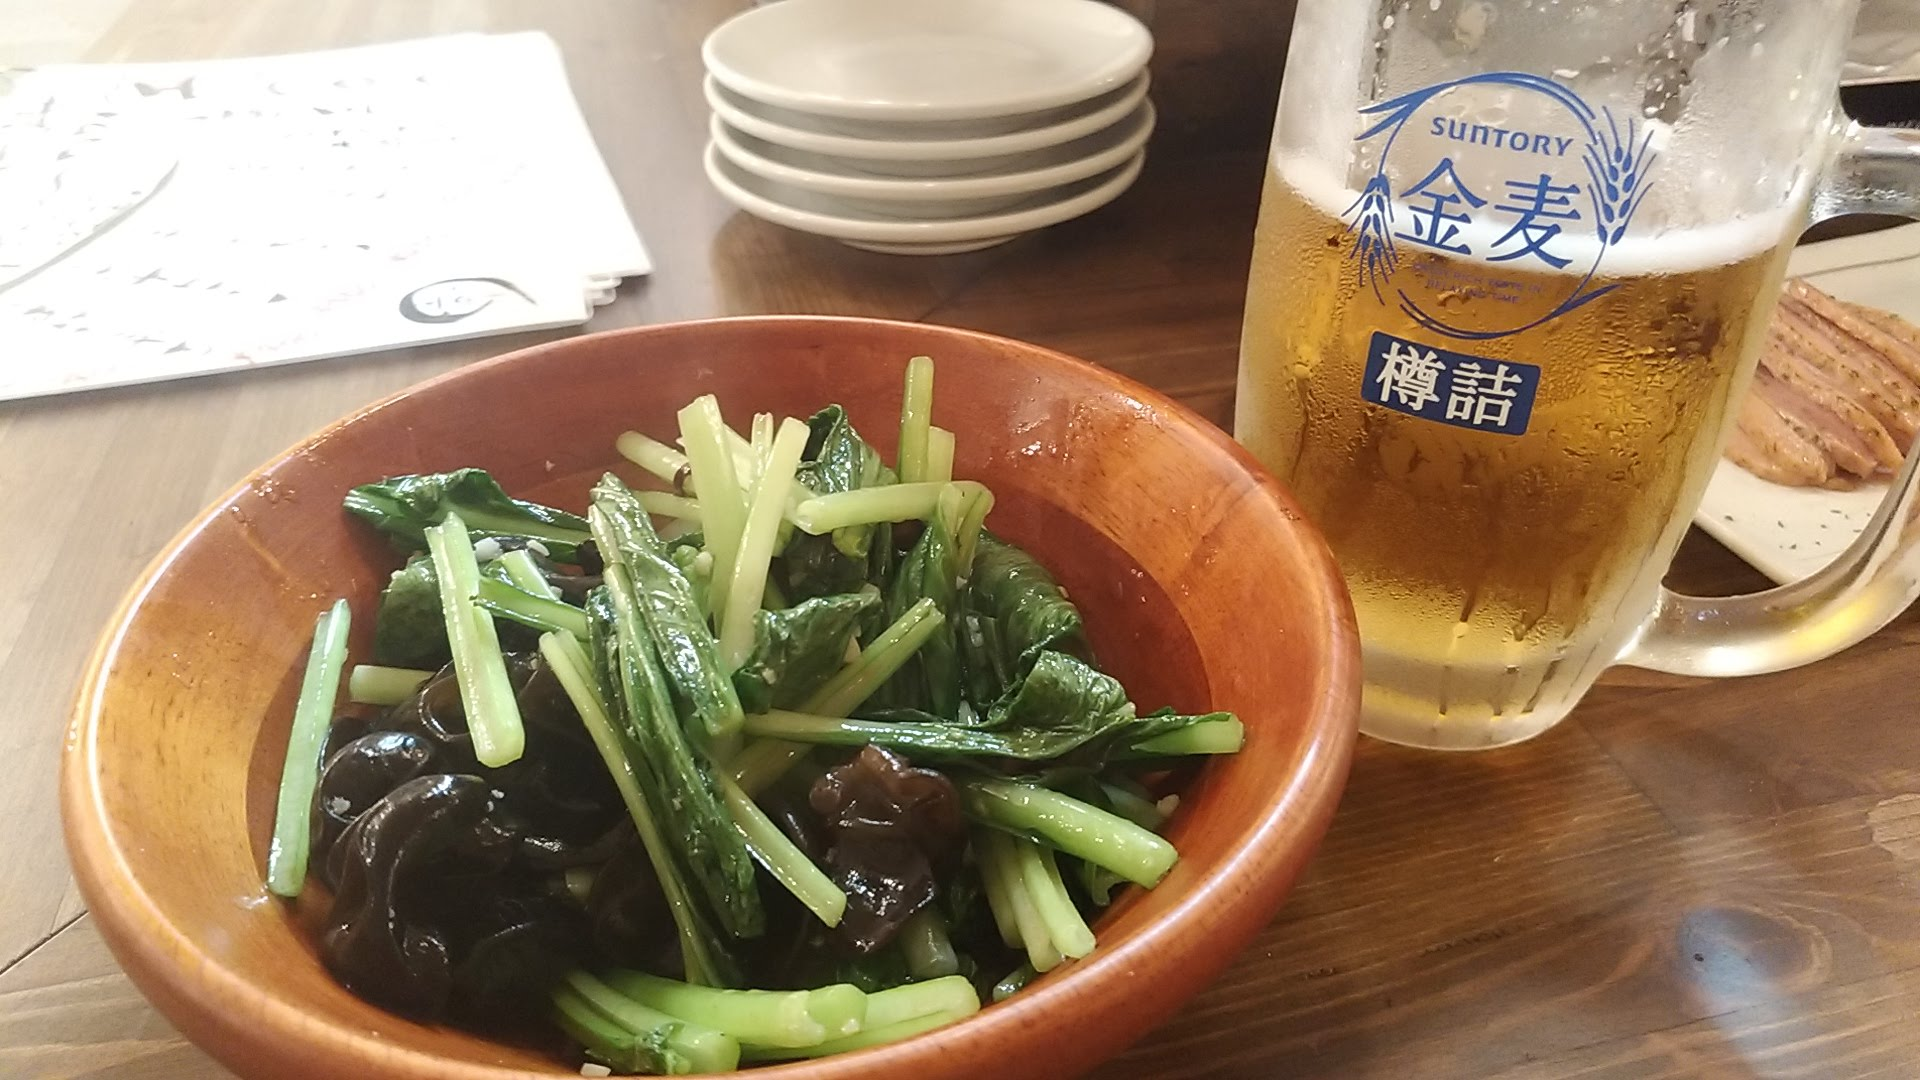 Stir-fried fresh green vegetables and jellyfish